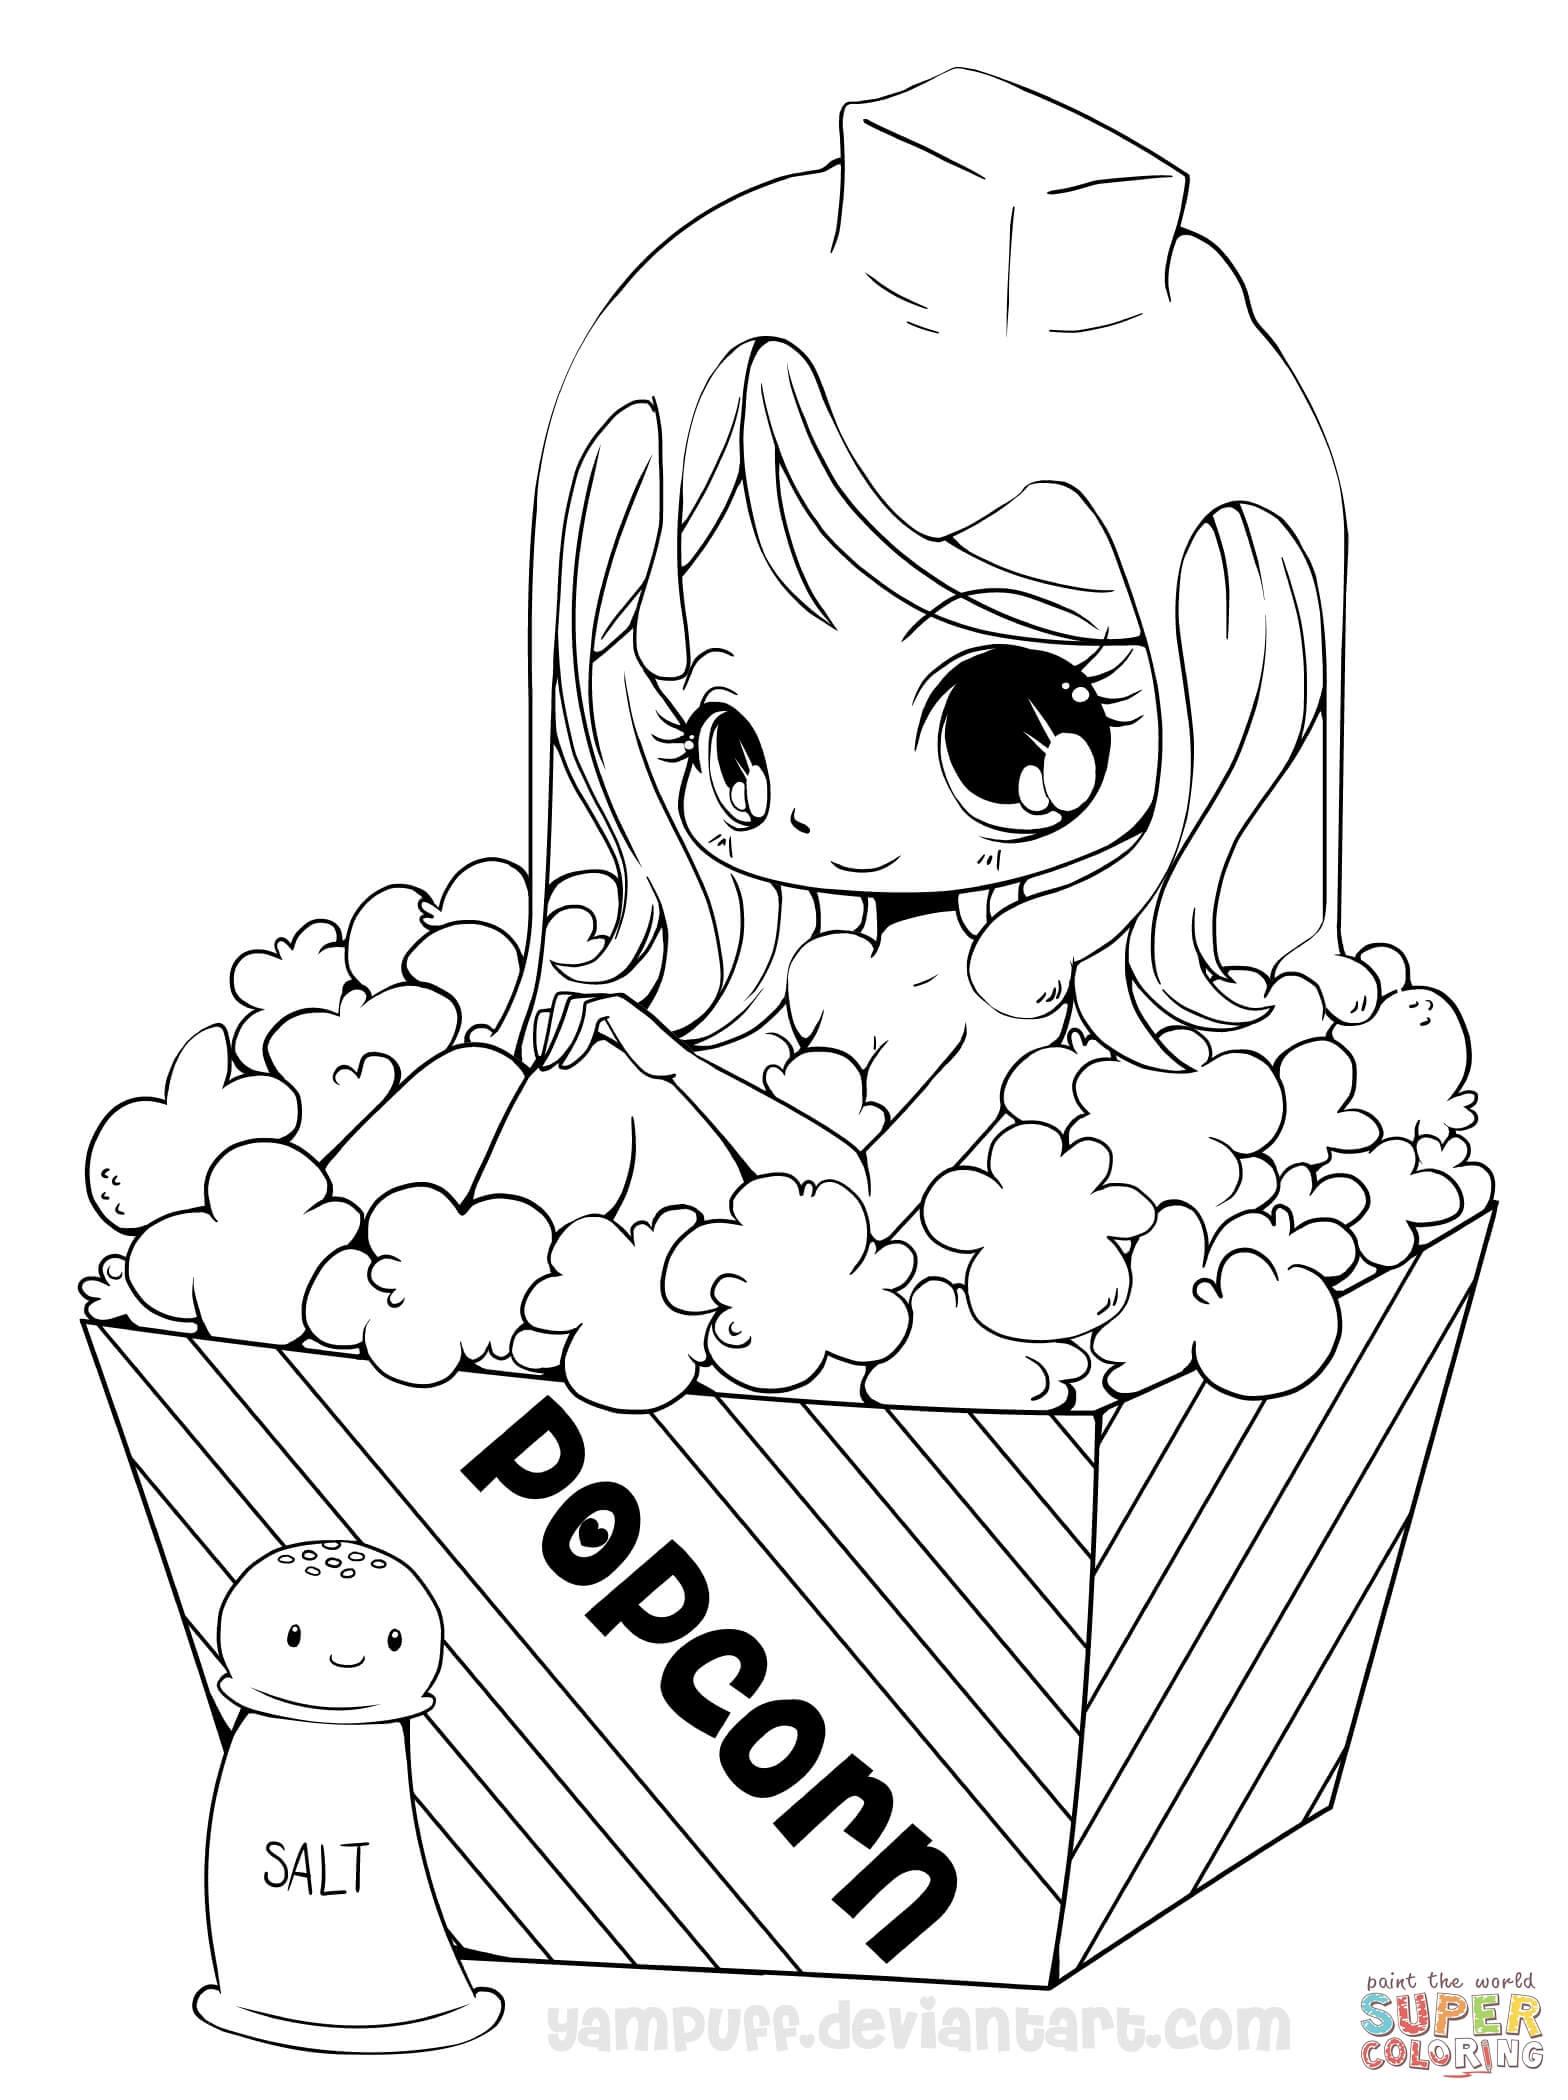 Chibi Popcorn Girl coloring page   Free Printable Coloring ...